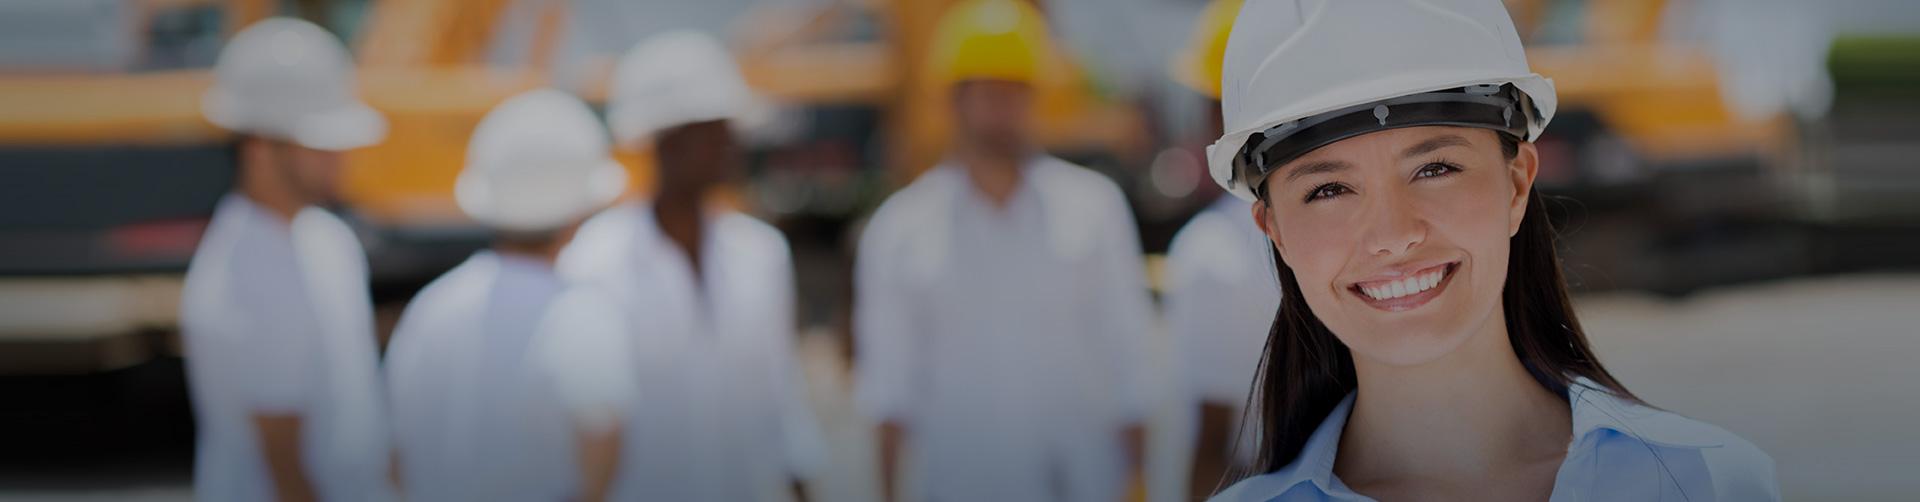 Leading construction in Dubai | Prestige constructions LLC